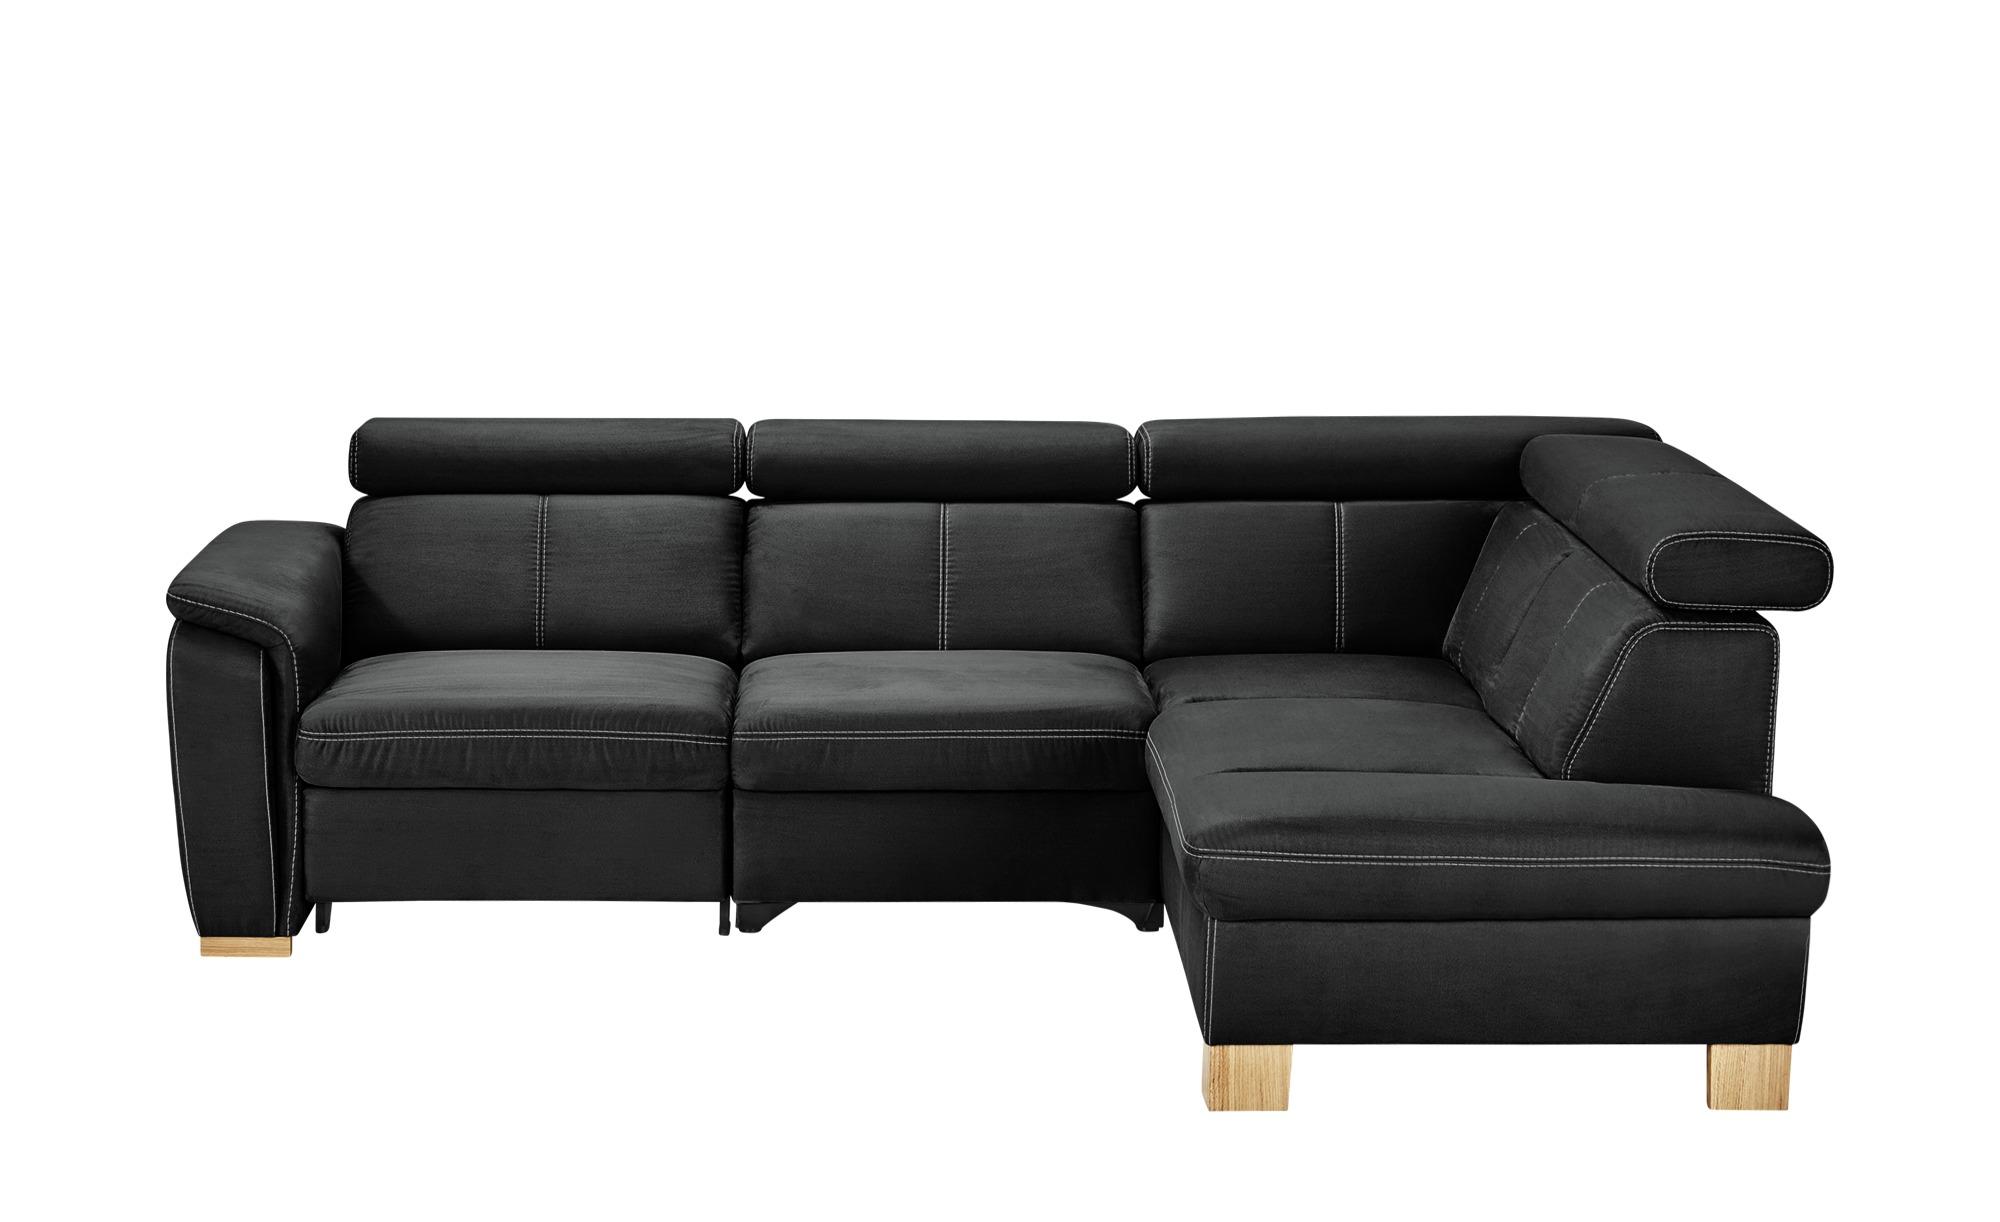 Ecksofa time breite h he 81 cm schwarz online kaufen bei for Ecksofa time